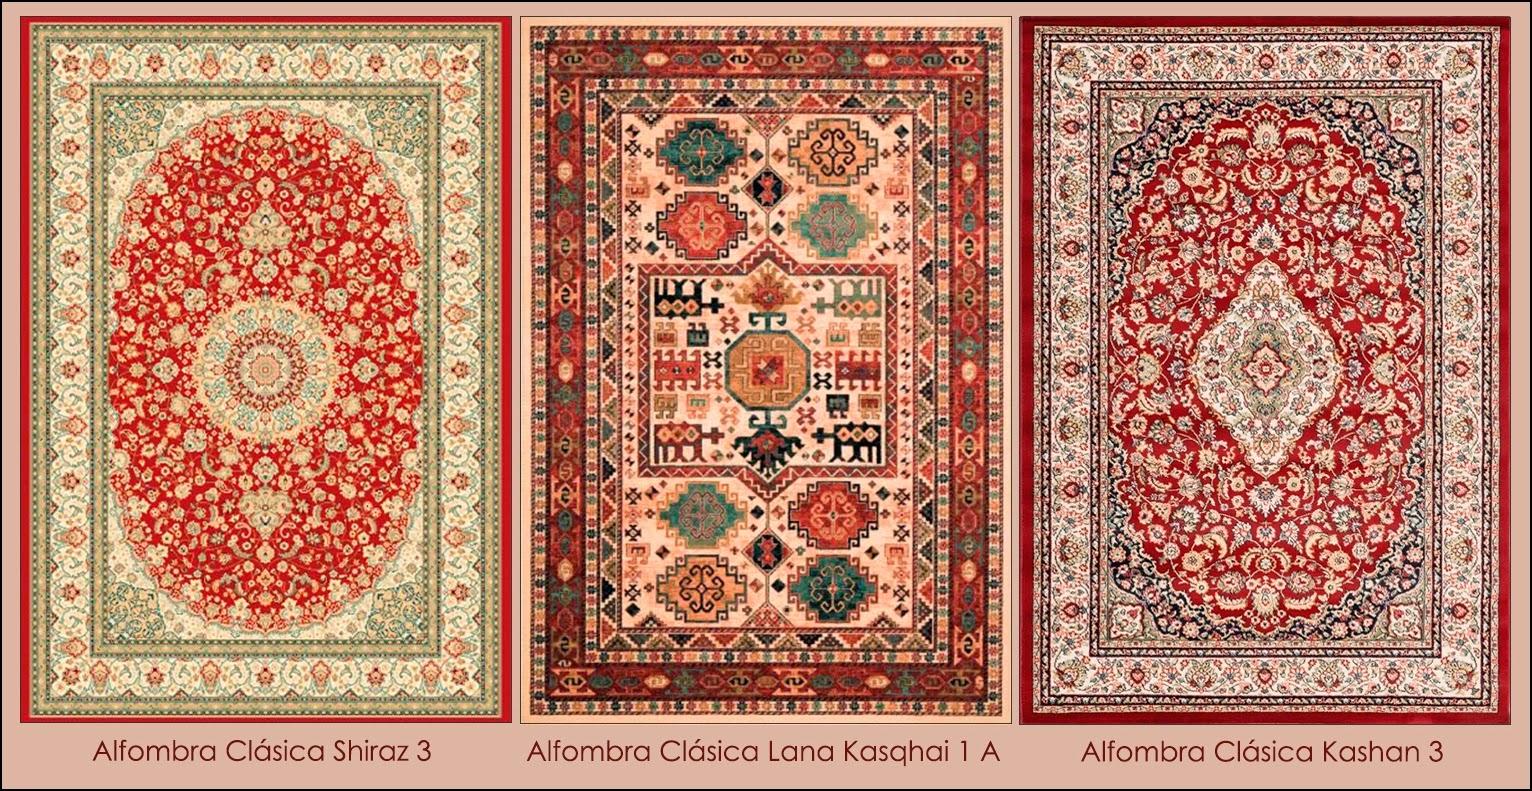 Blog de mbar muebles alfombras - Catalogo alfombras ...